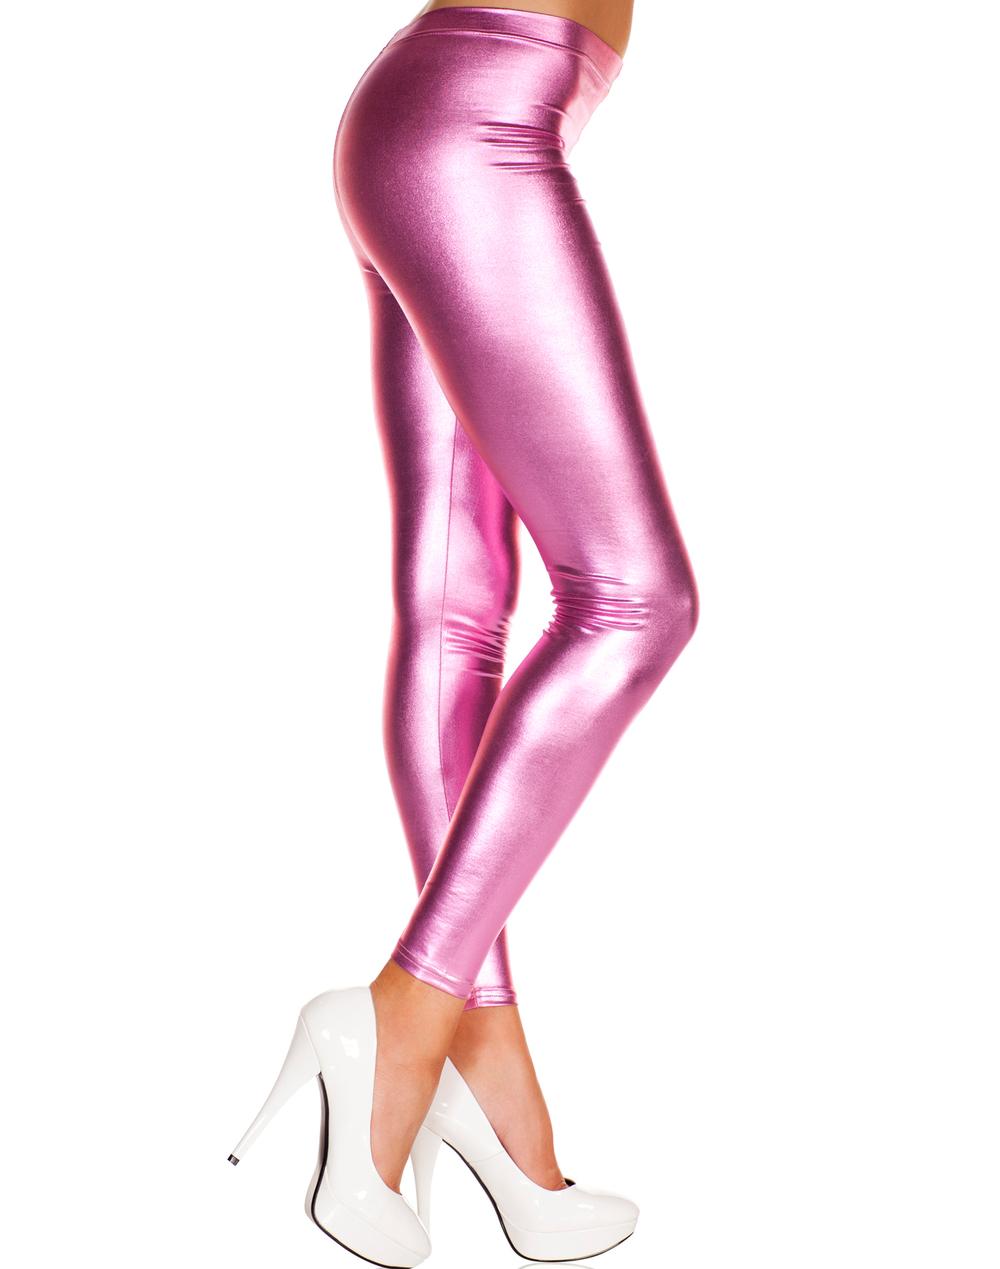 35110 pink-1 copy.jpg